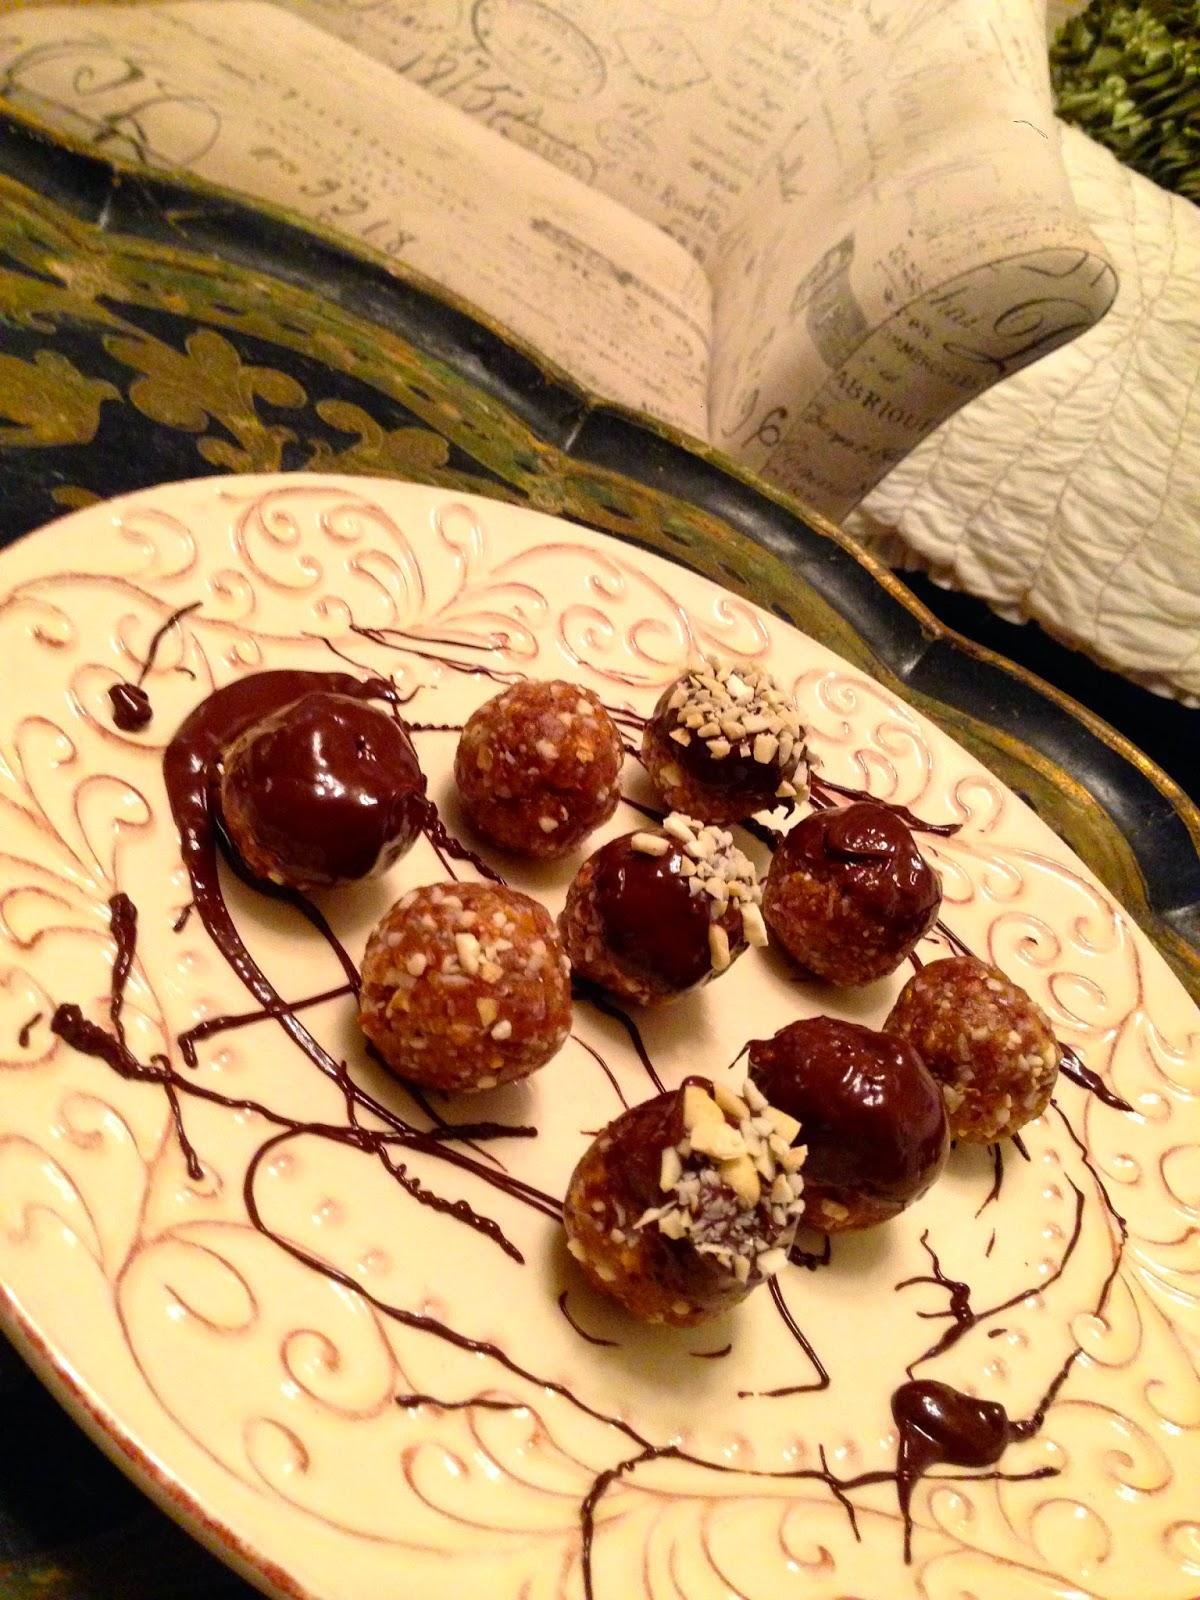 Pina Colada Cookies by BeautyBeyondBones #edrecovery #glutenfree #vegan #paleo #dessert #food #healthyfood